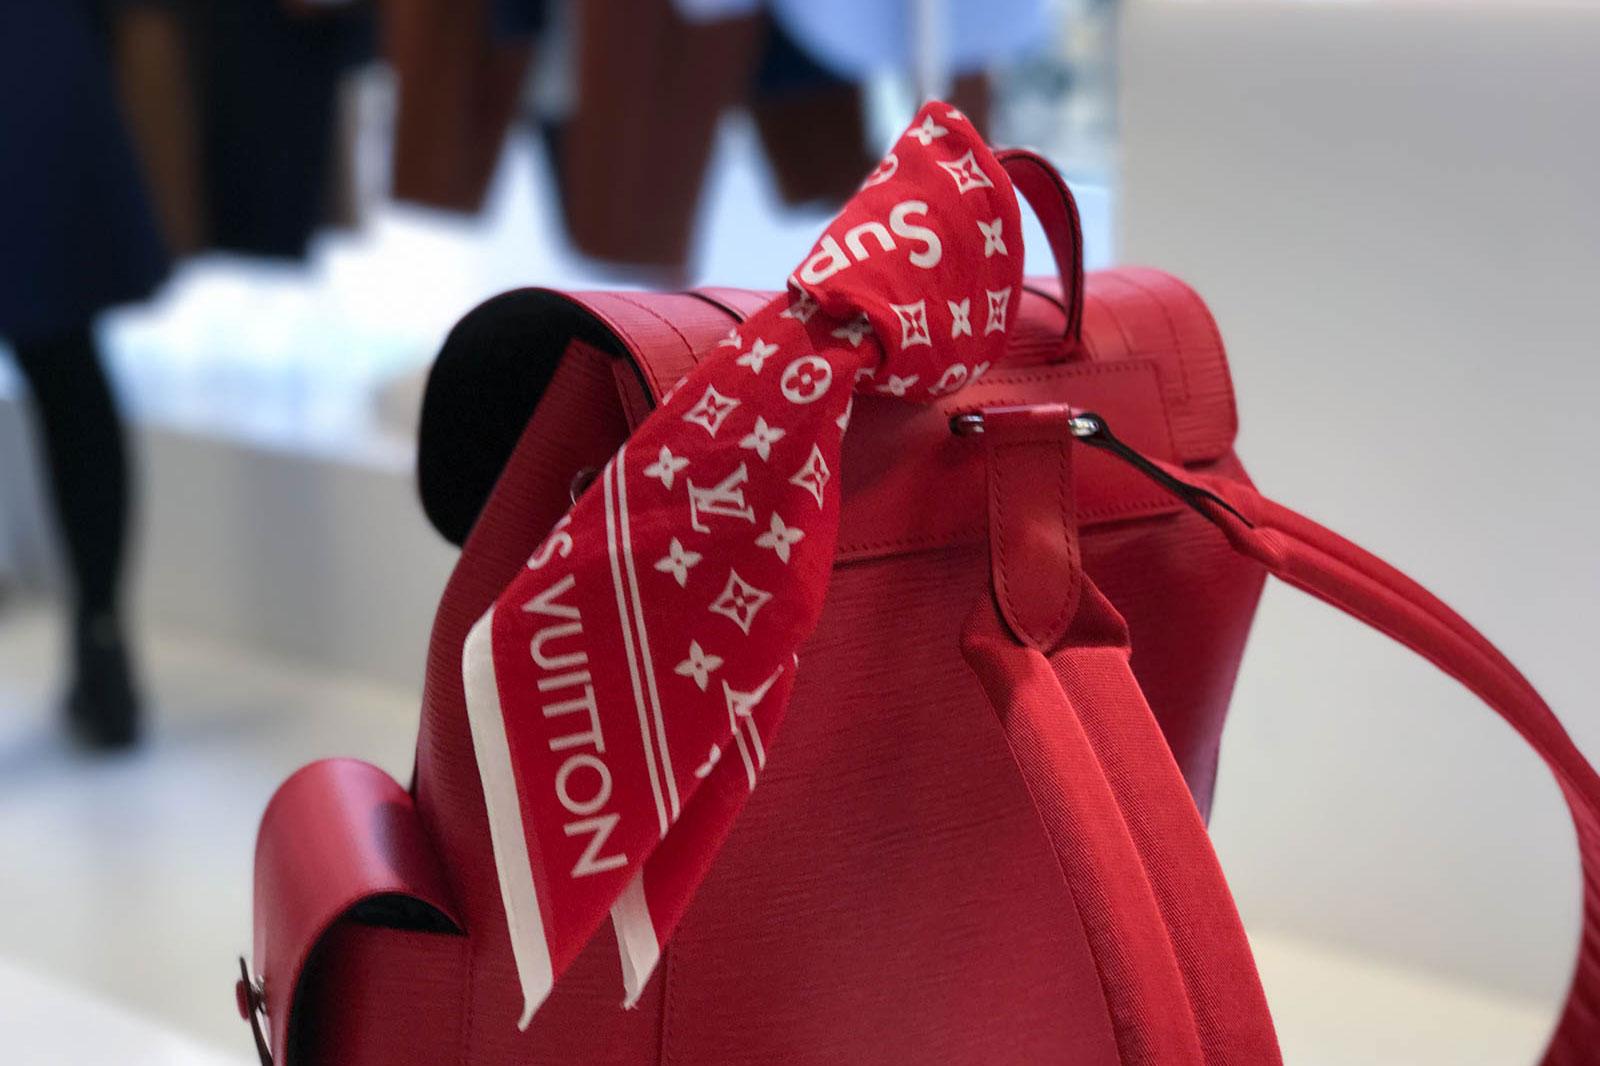 Supreme x Louis Vuitton 2017 Fall/Winter Closer Look Showroom - 3703565